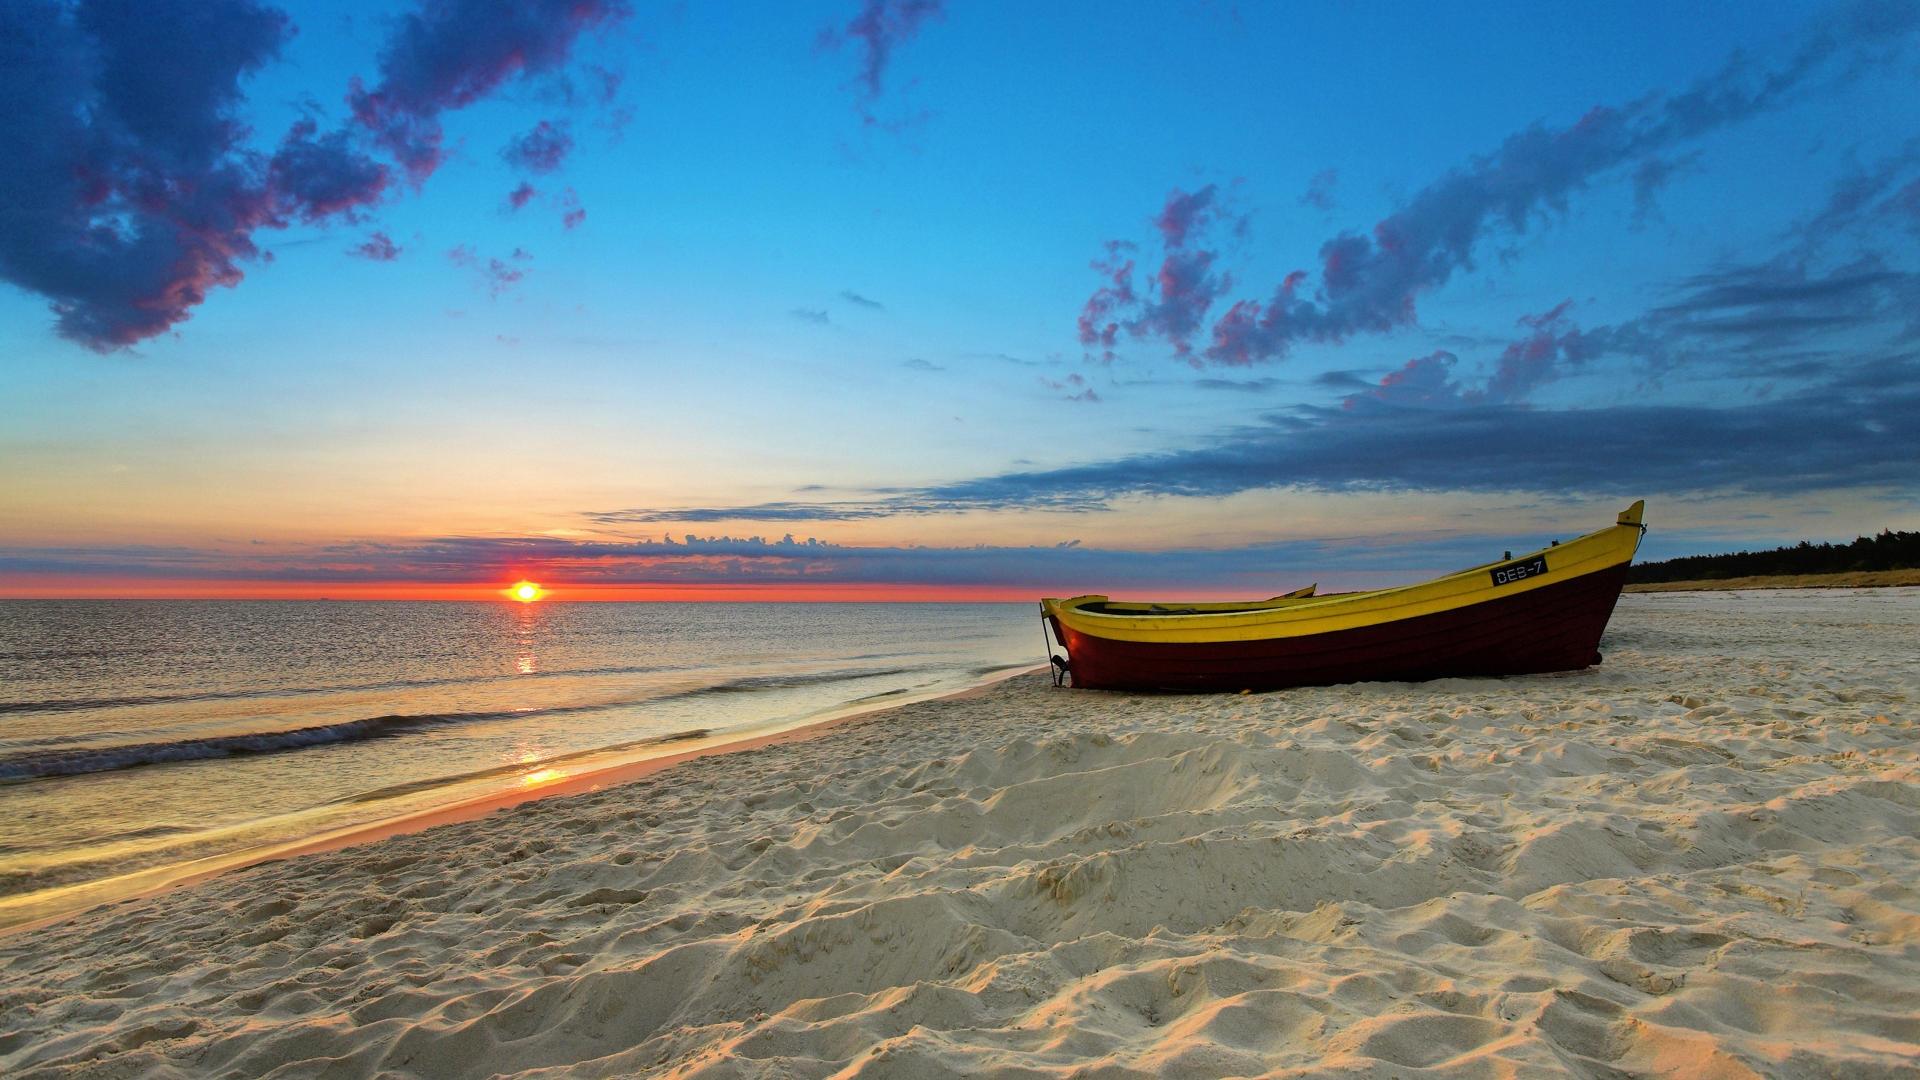 wallpaper : boat, sunset, sea, bay, shore, sand, sky, vehicle, beach